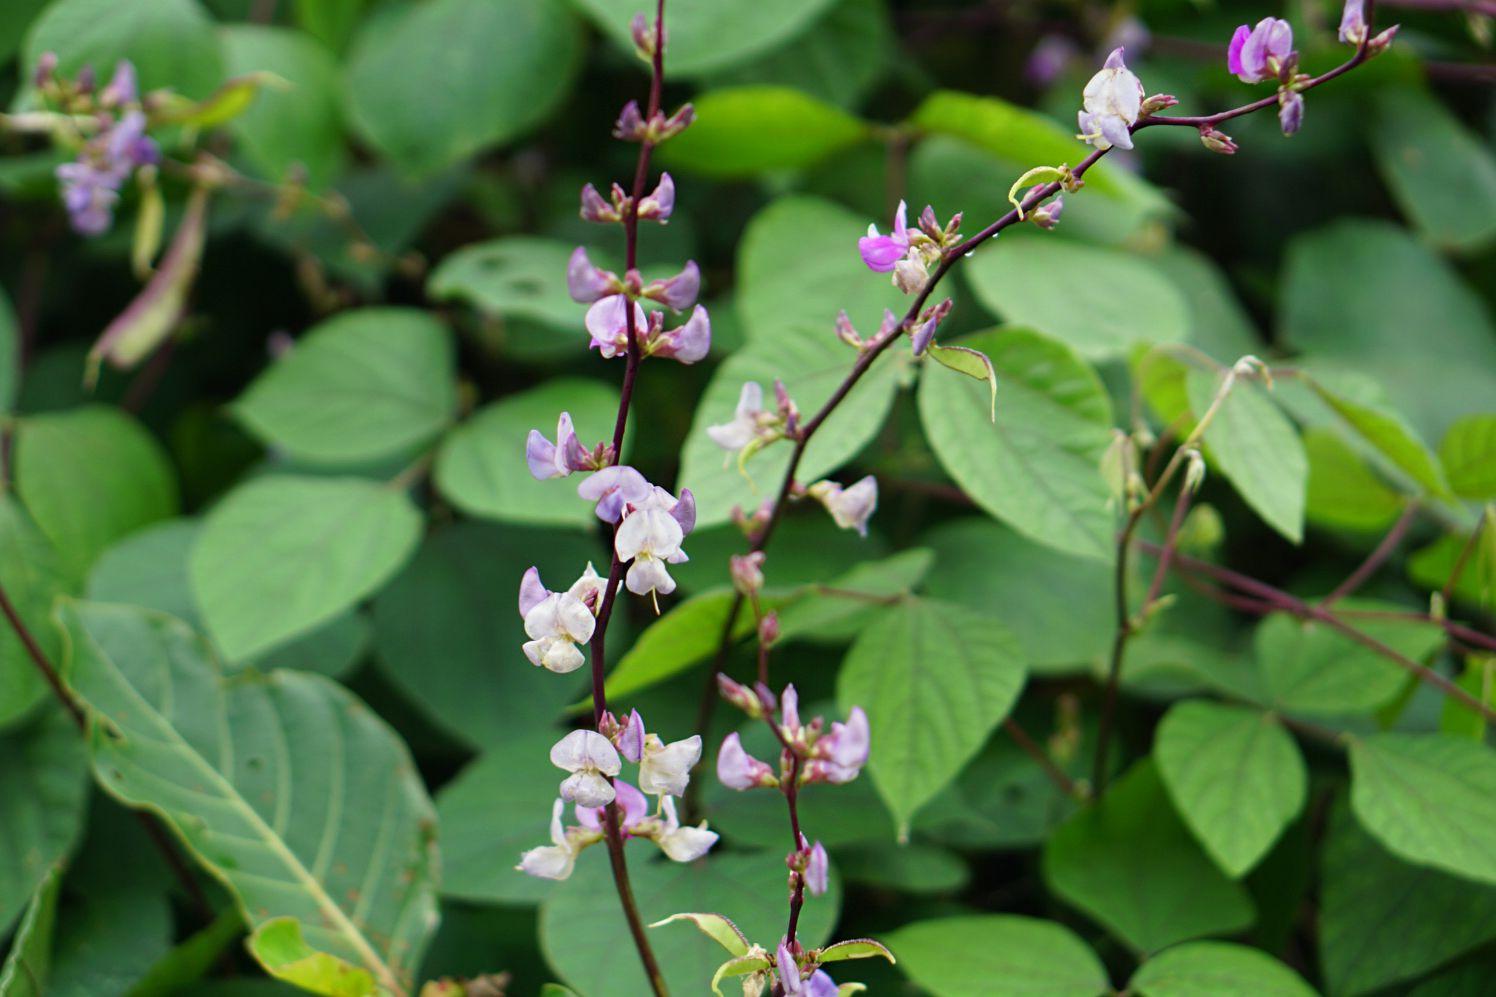 purple hyacinth bean plant